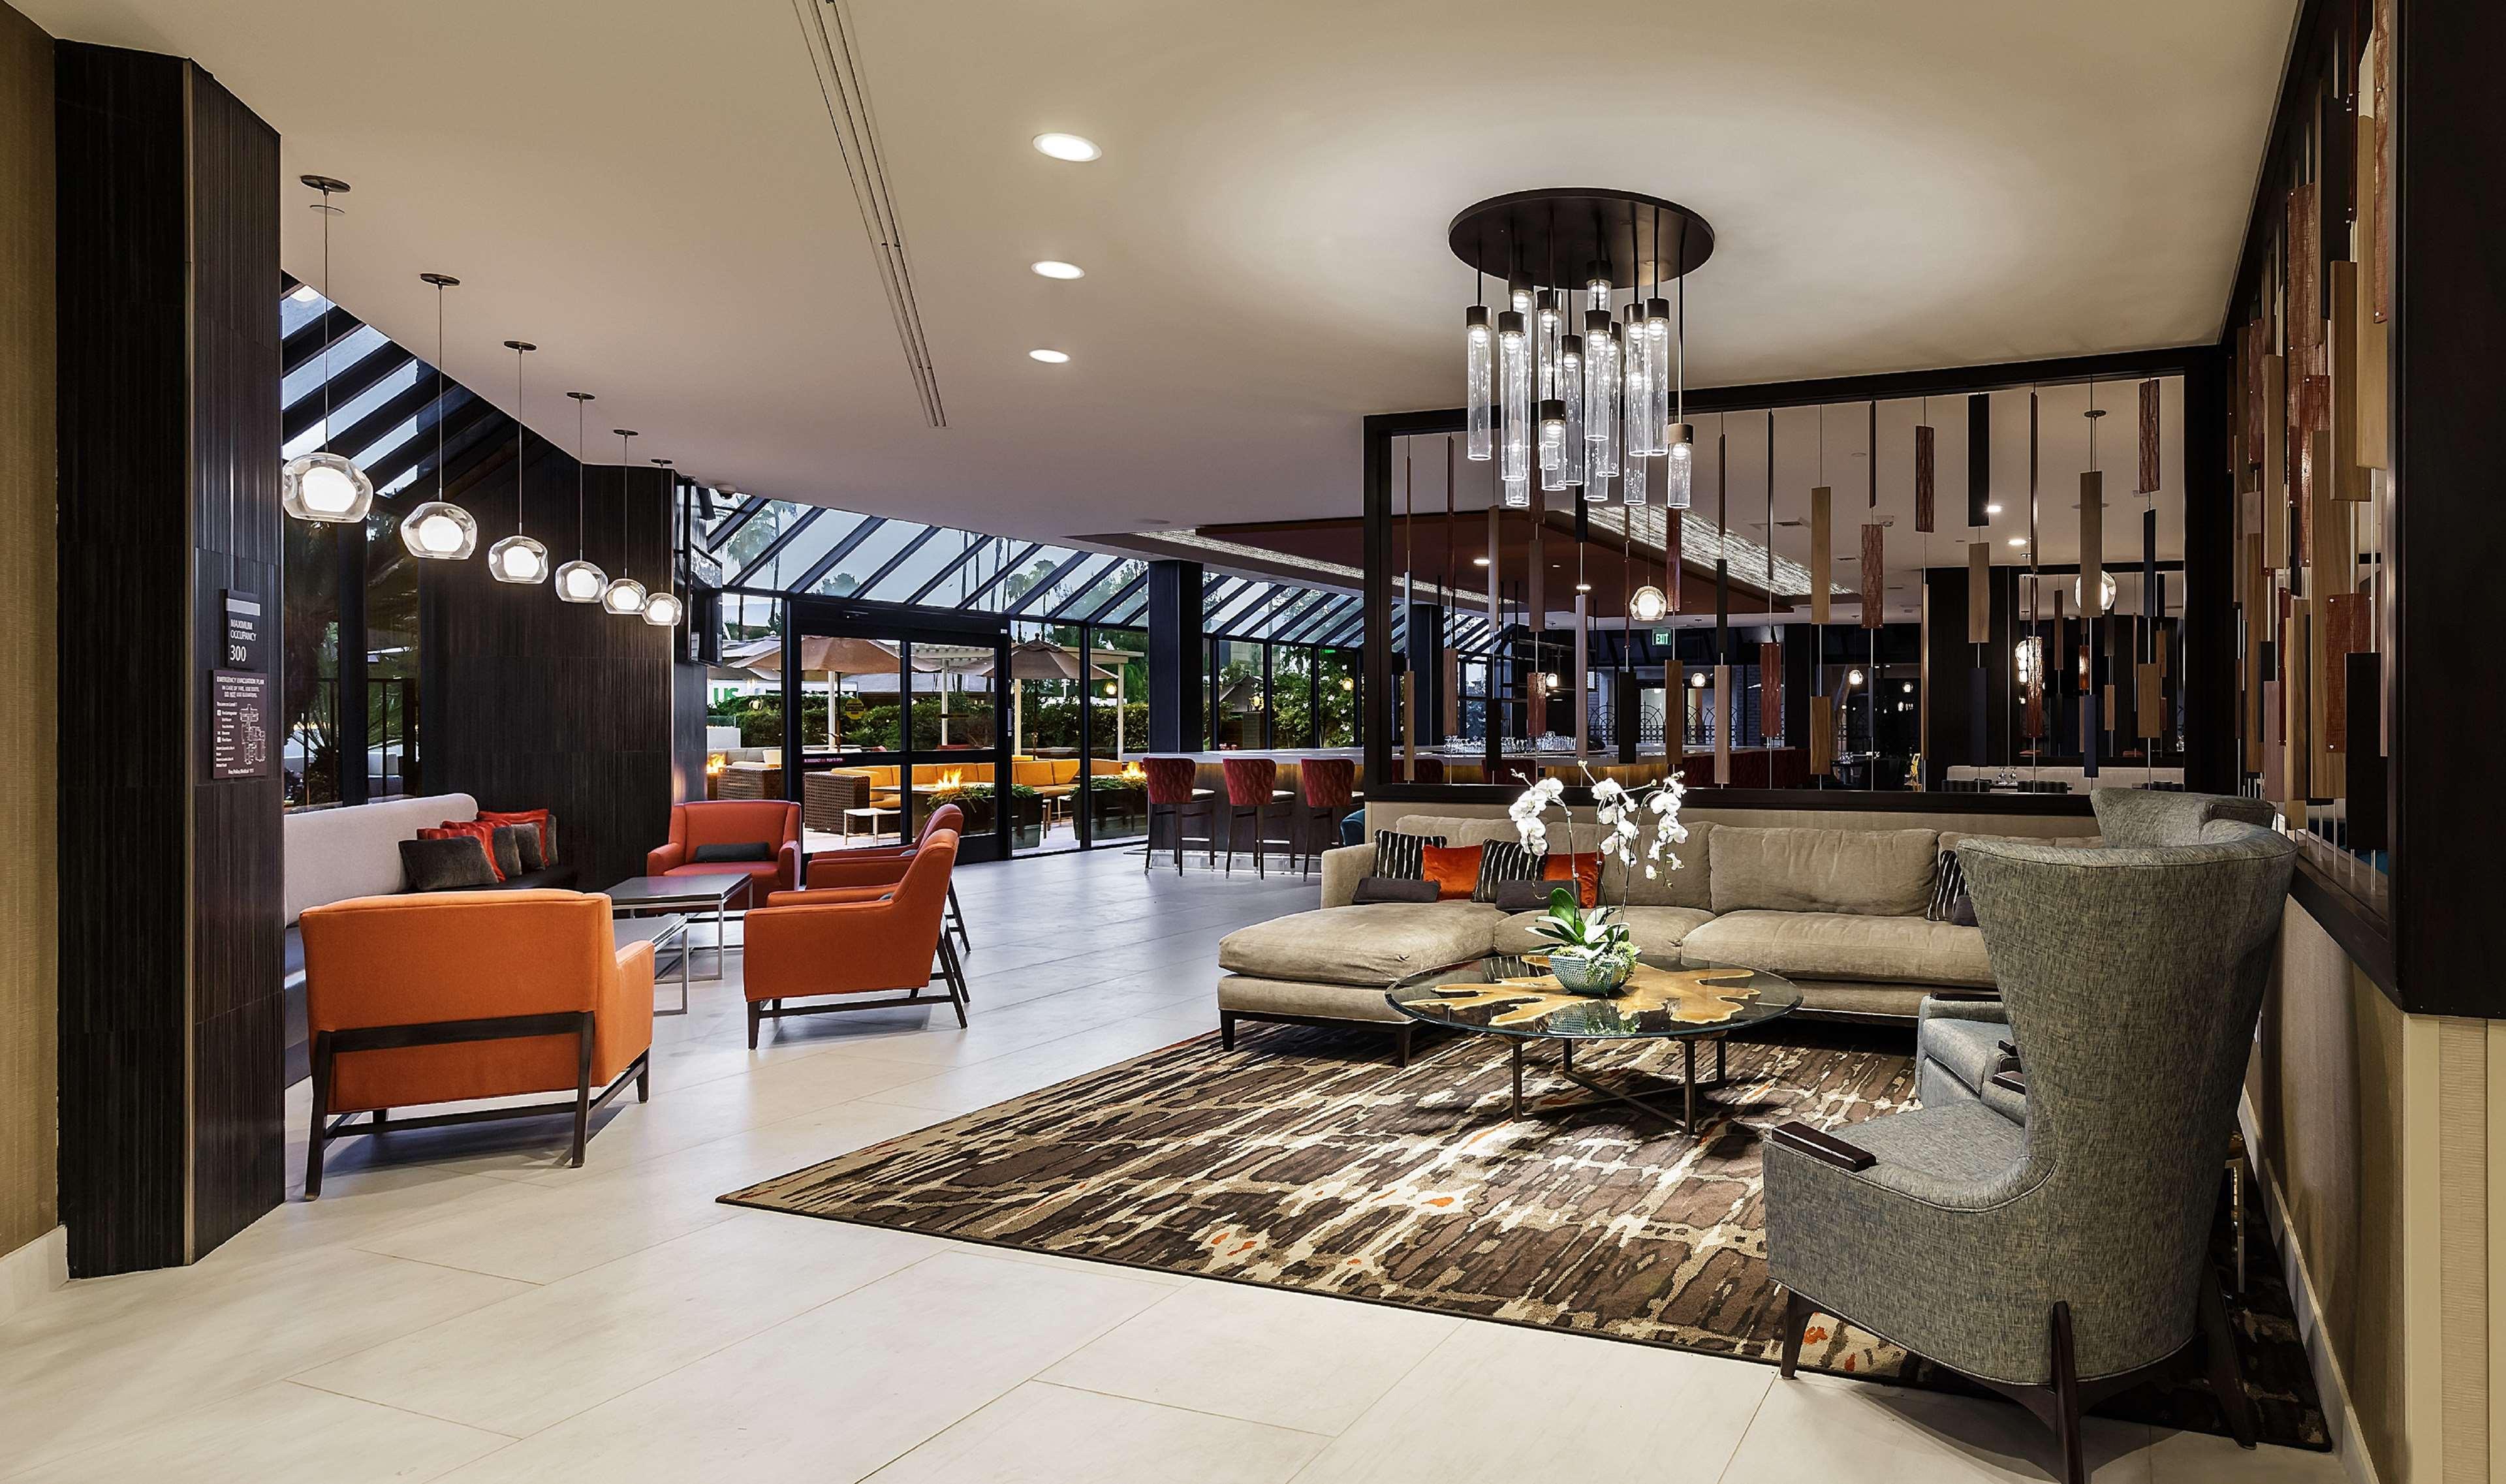 DoubleTree by Hilton Hotel San Bernardino image 6